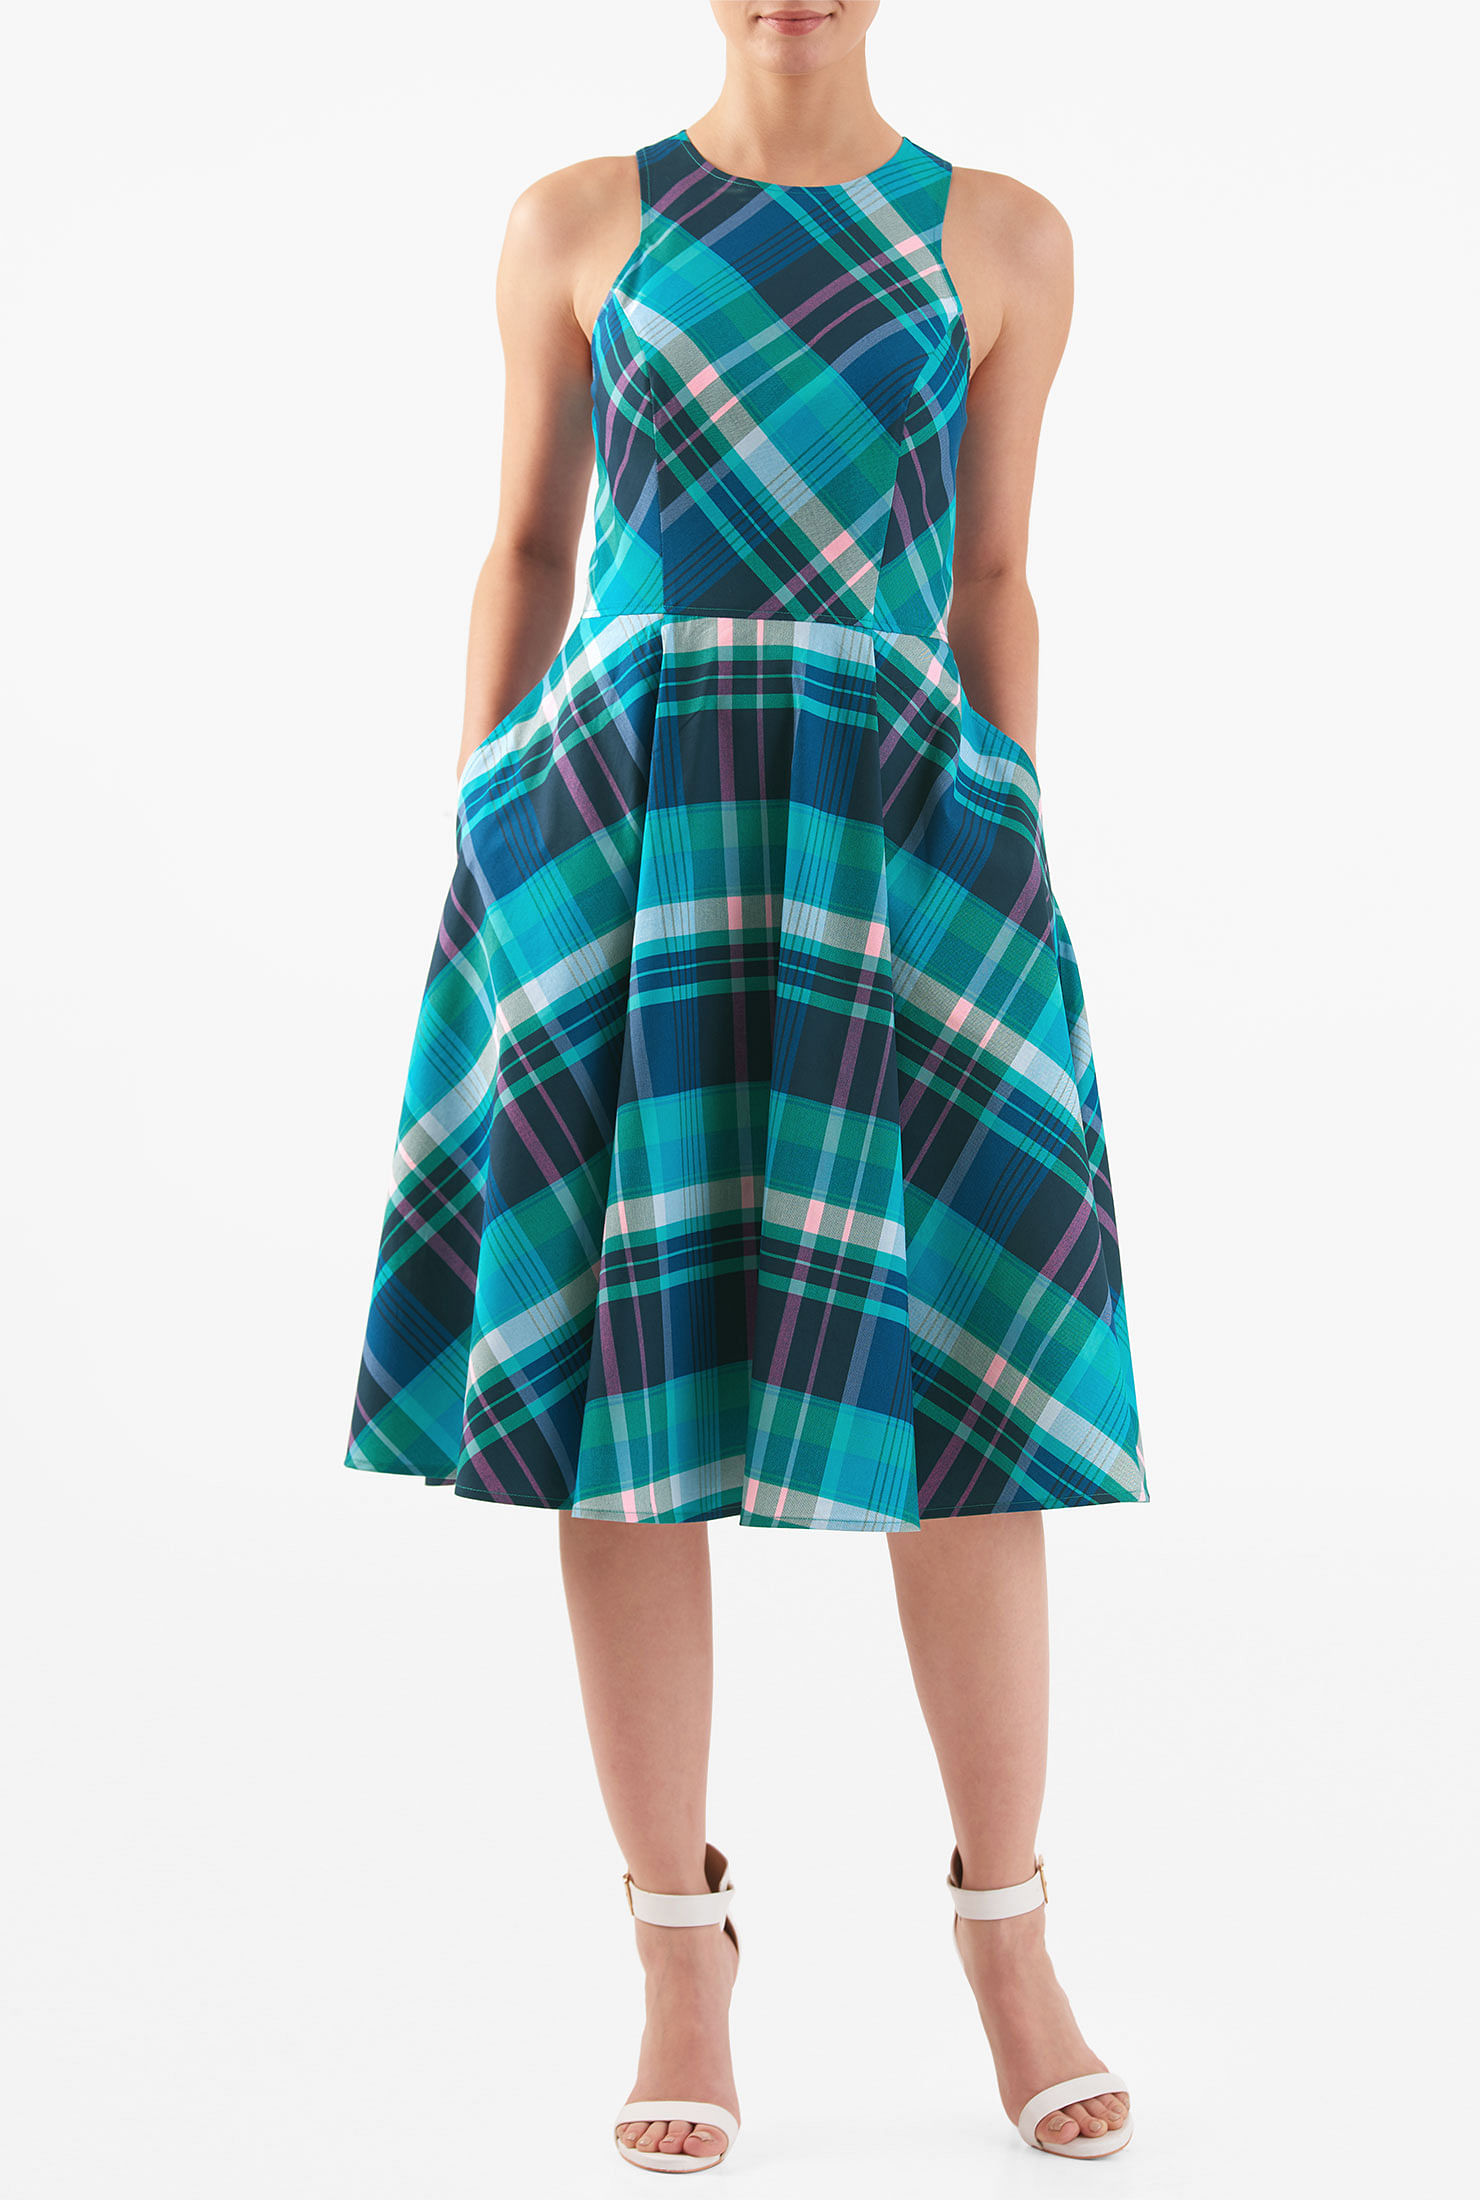 7290baeecb Women's Fashion Clothing 0-36W and Custom